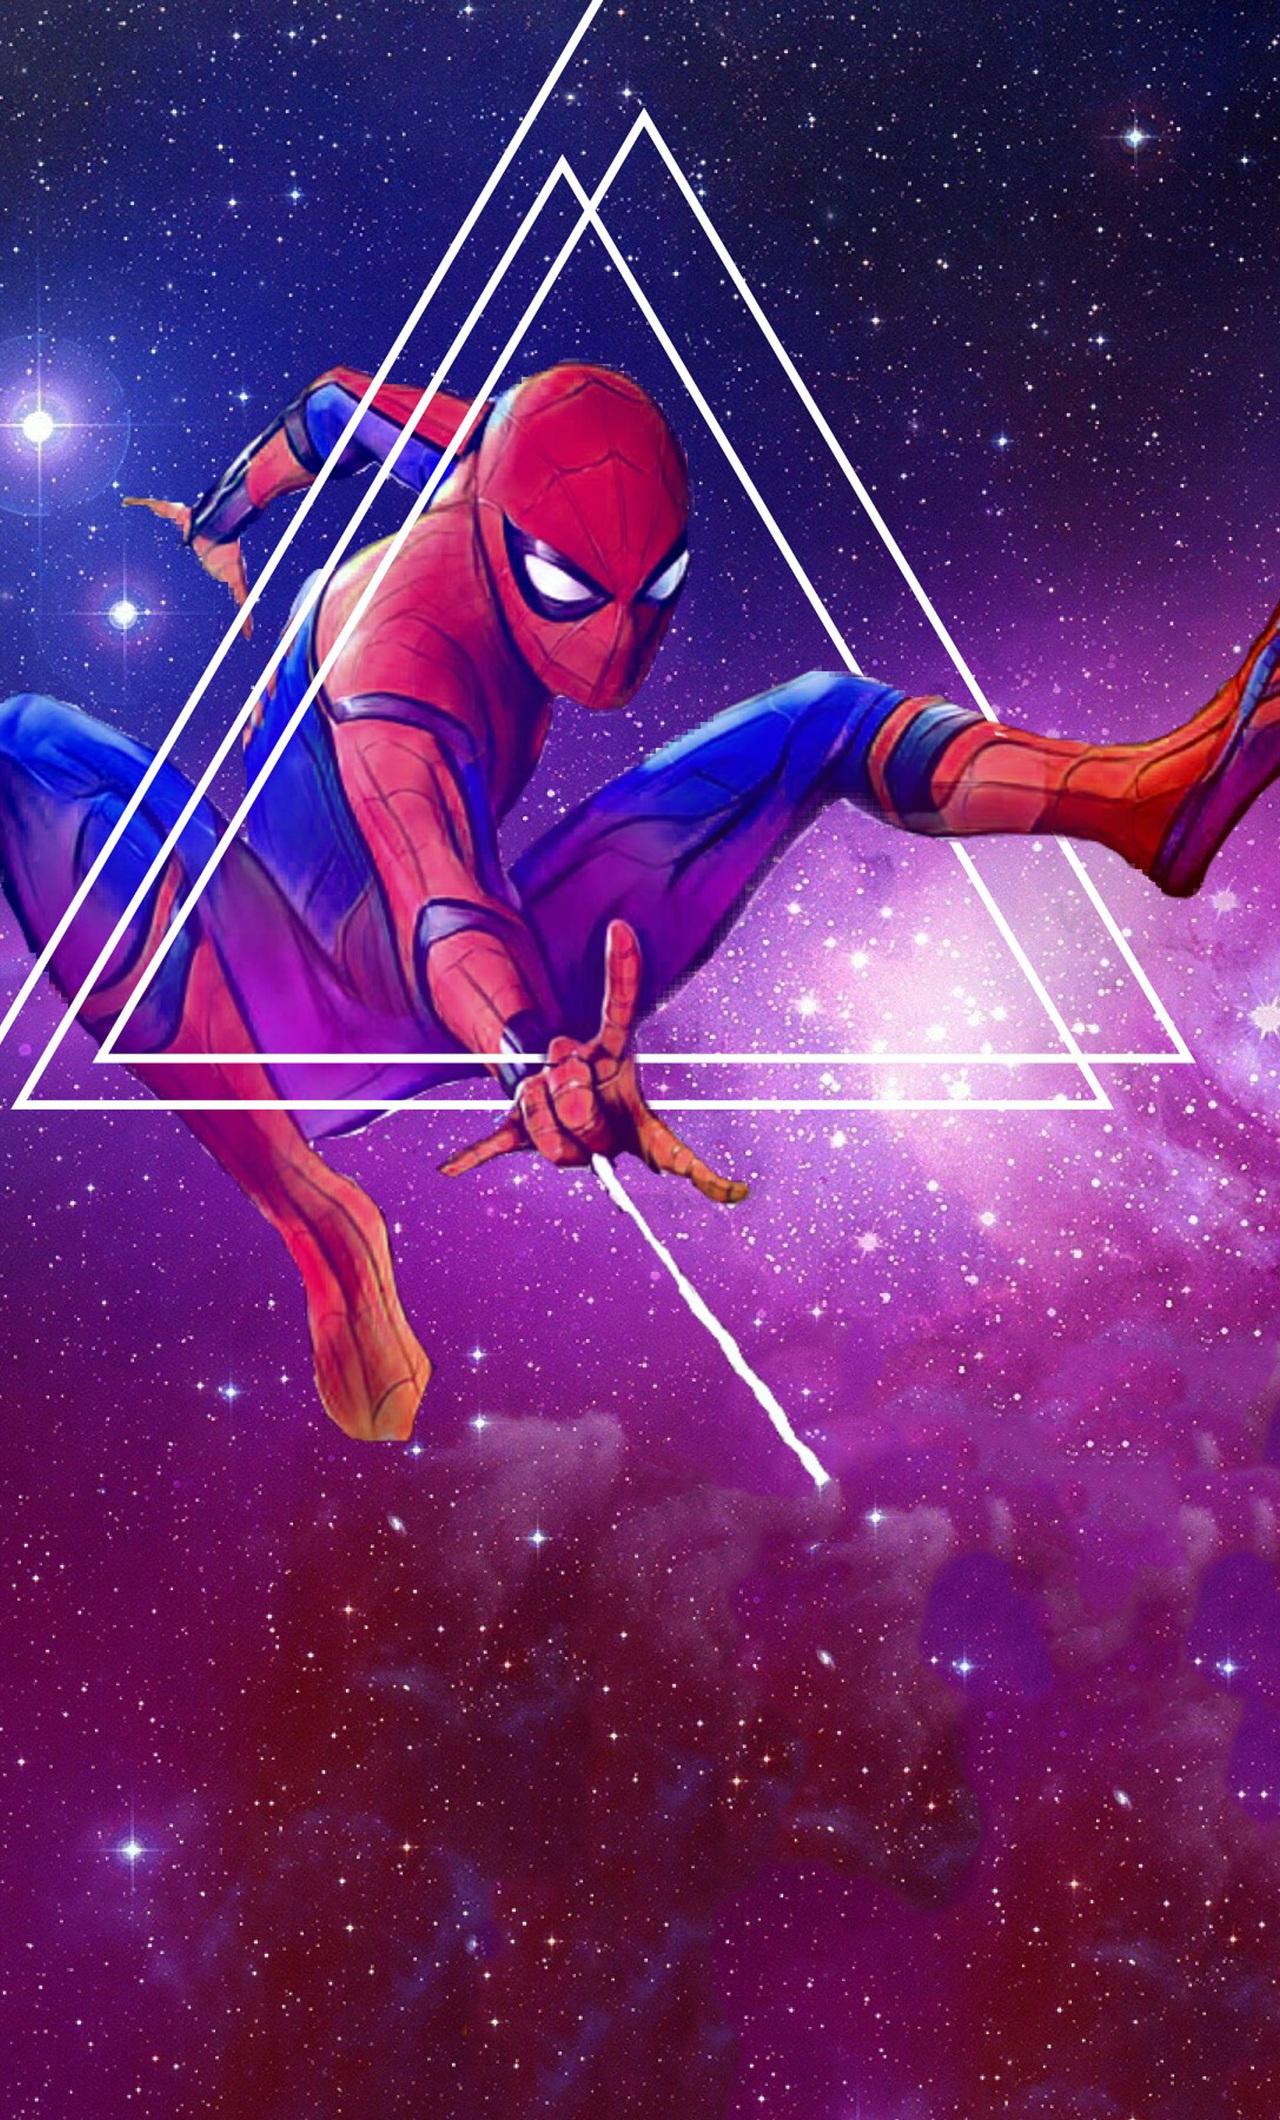 1280x2120 spiderman avengers infinity war artwork iphone 6 for Sfondi infinity